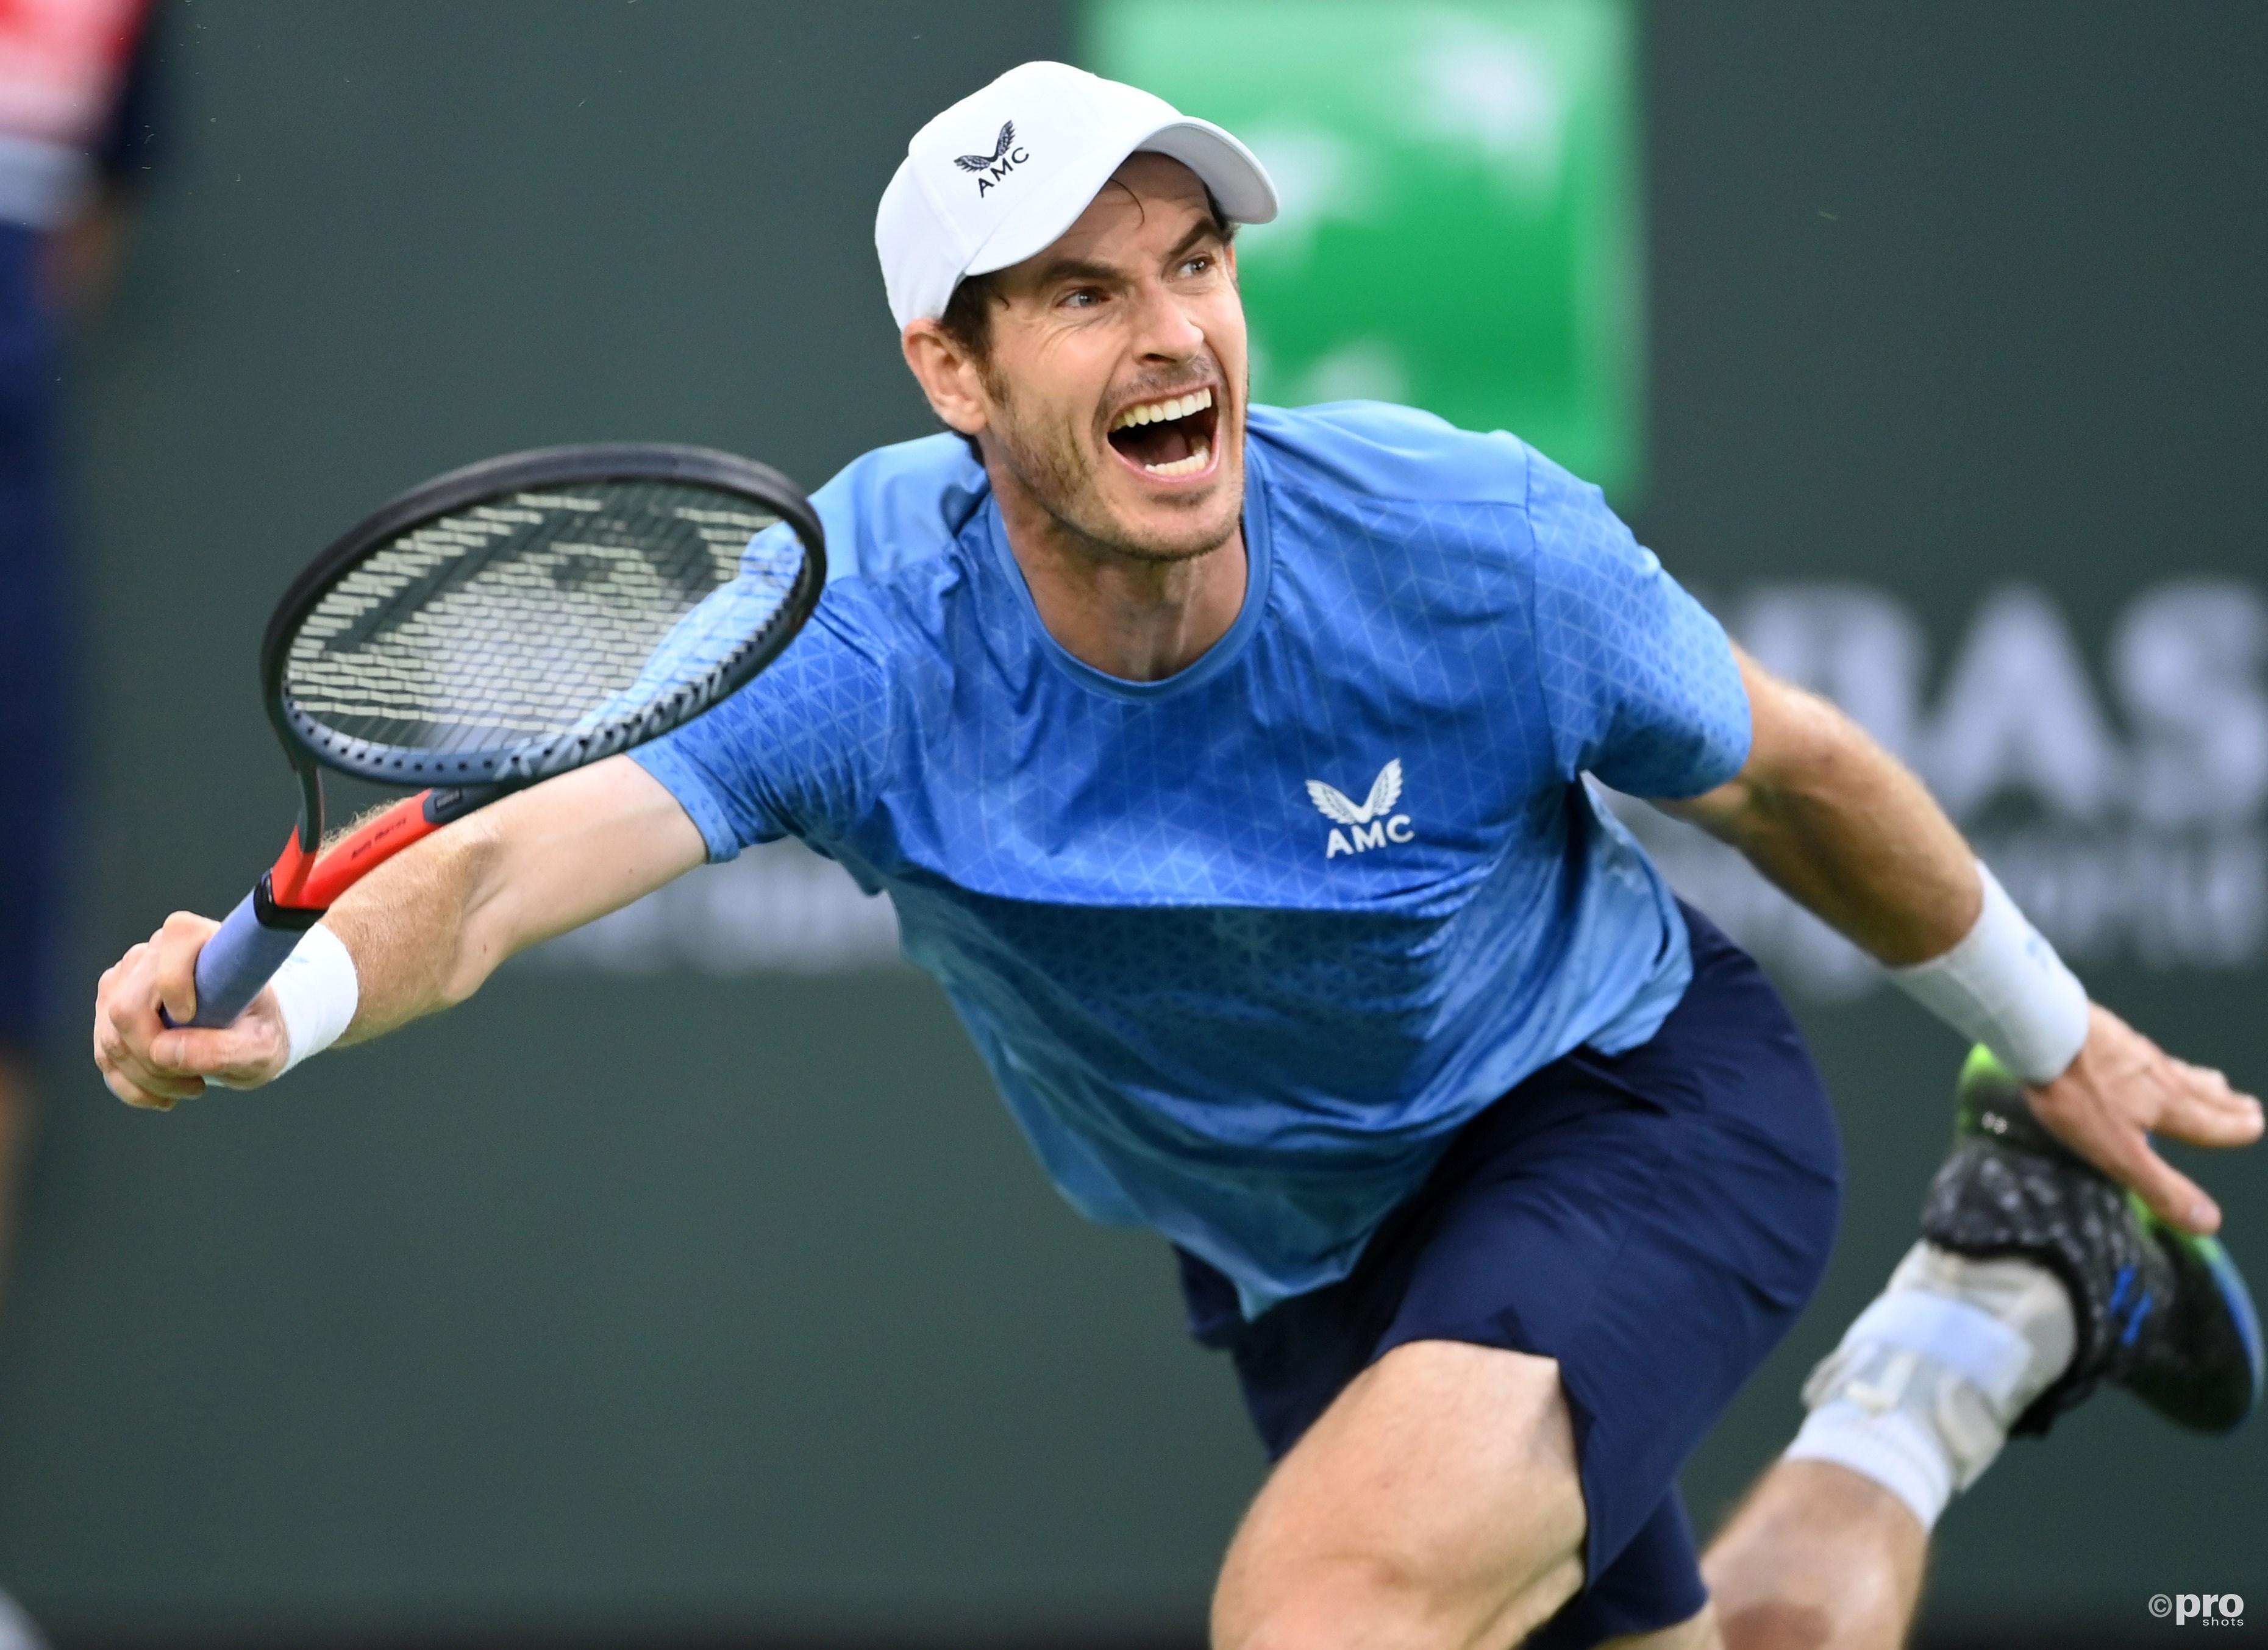 Andy Murray defeats Hubert Hurkacz in Vienna opening round